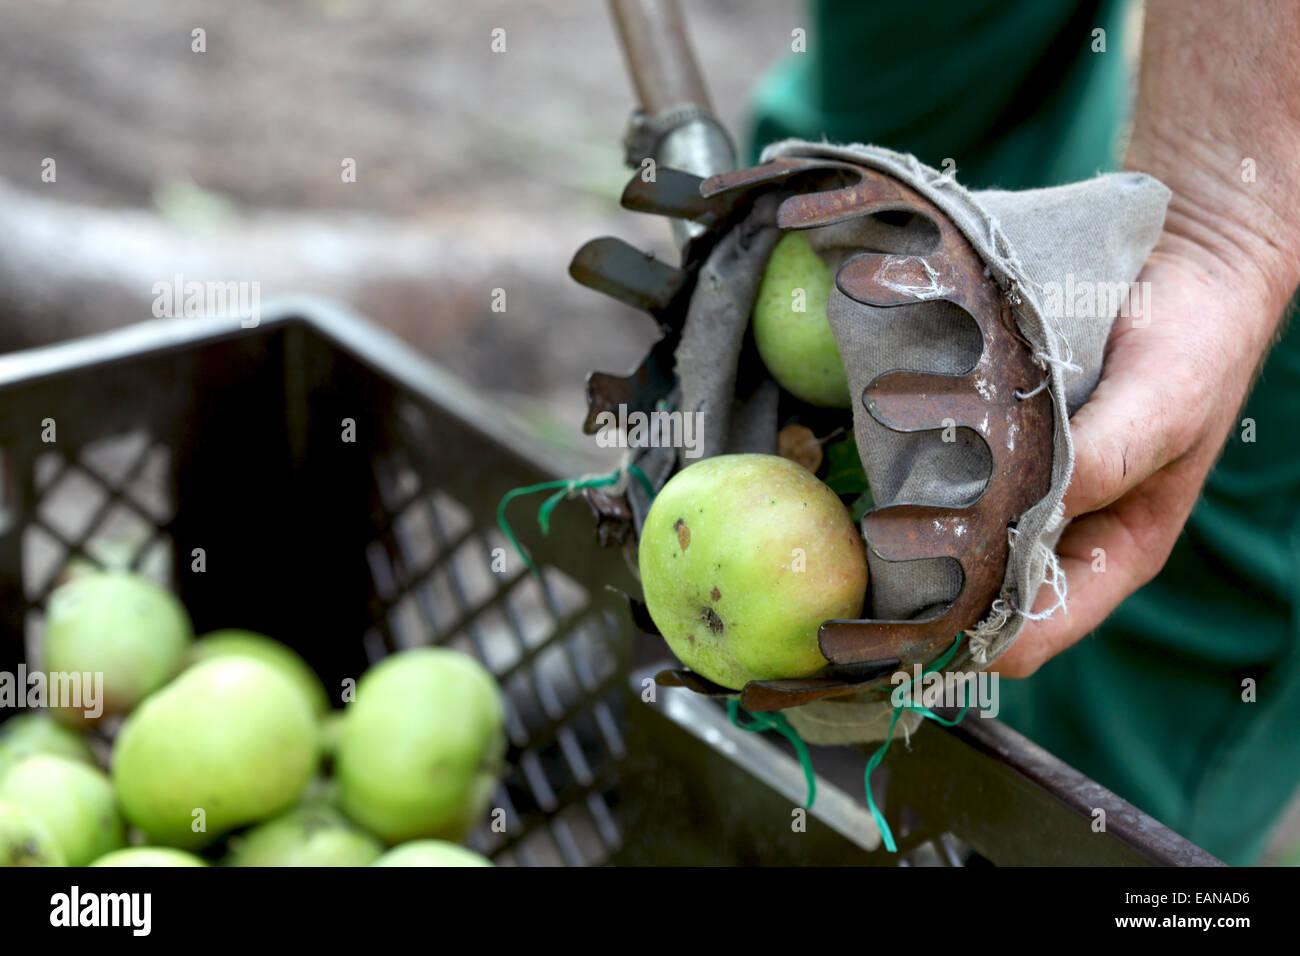 Urban apple harvest using a pick aid - Stock Image